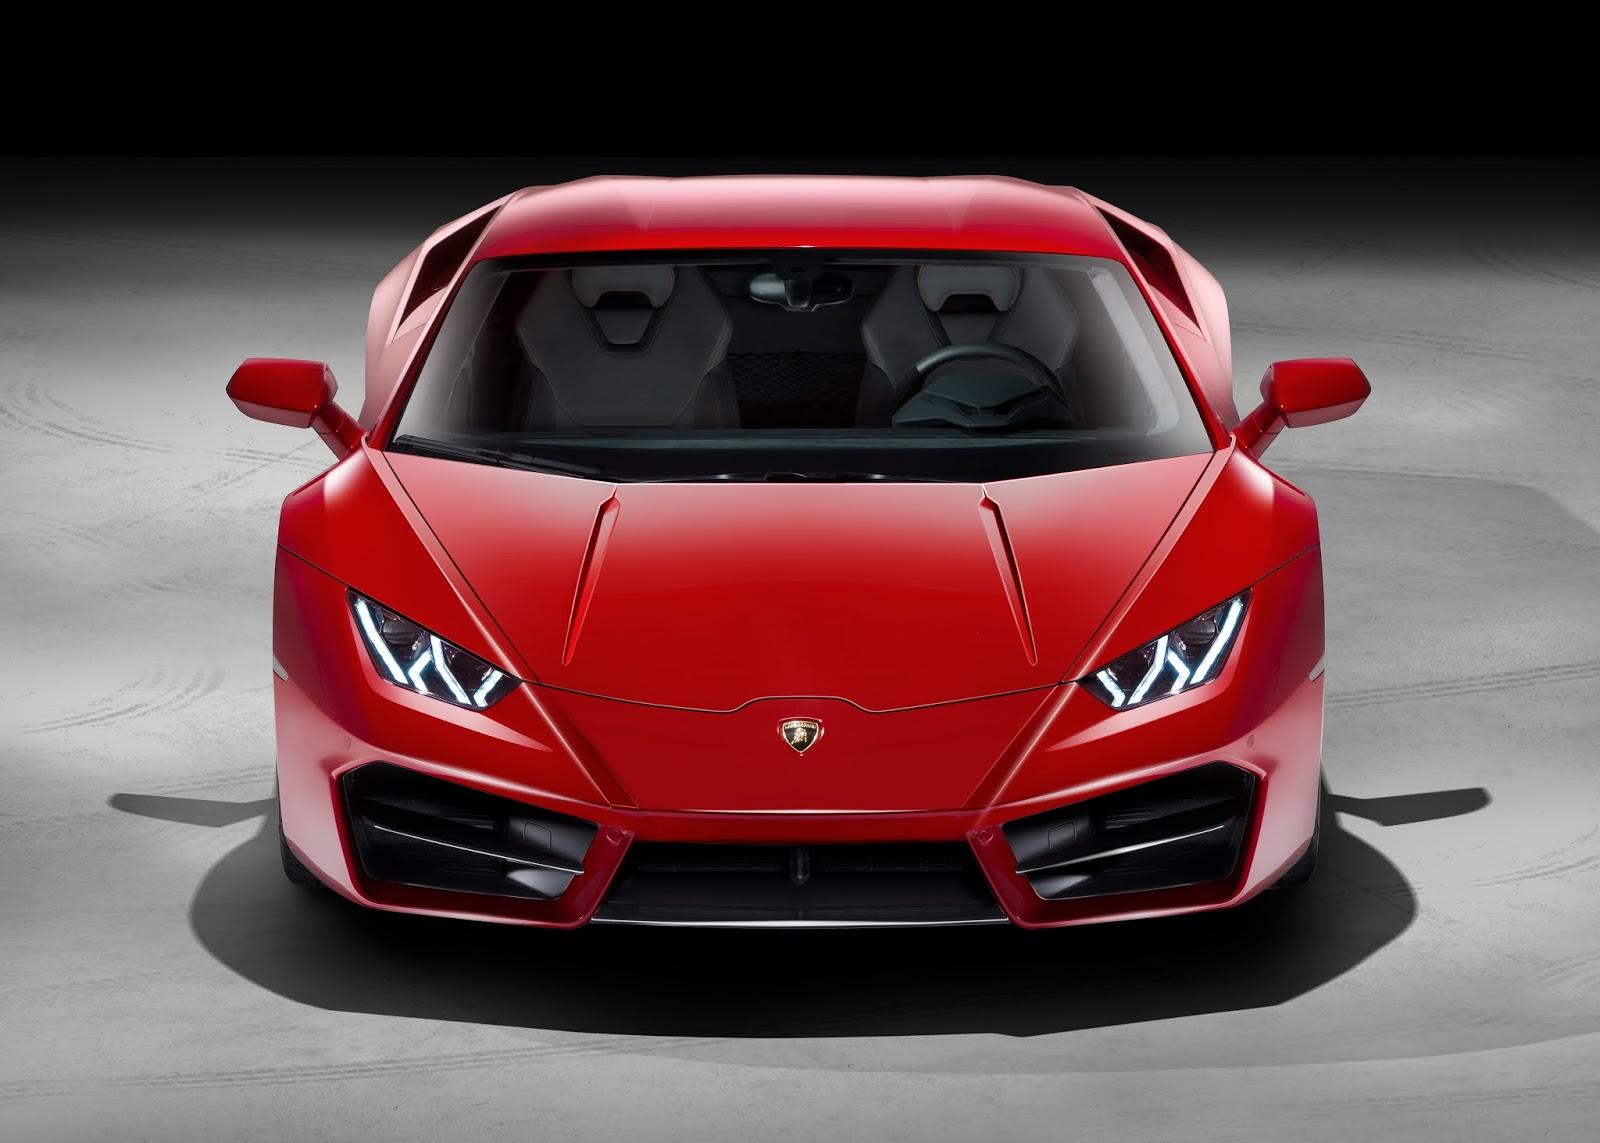 409535 Lamborghini Huracan LP580-2 : Η πιο fun to drive Lamborghini είναι πισωκίνητη και η φθηνότερη Lamborghini, Lamborghini Huracan, Lamborghini Huracan LP580-2, supercars, videos